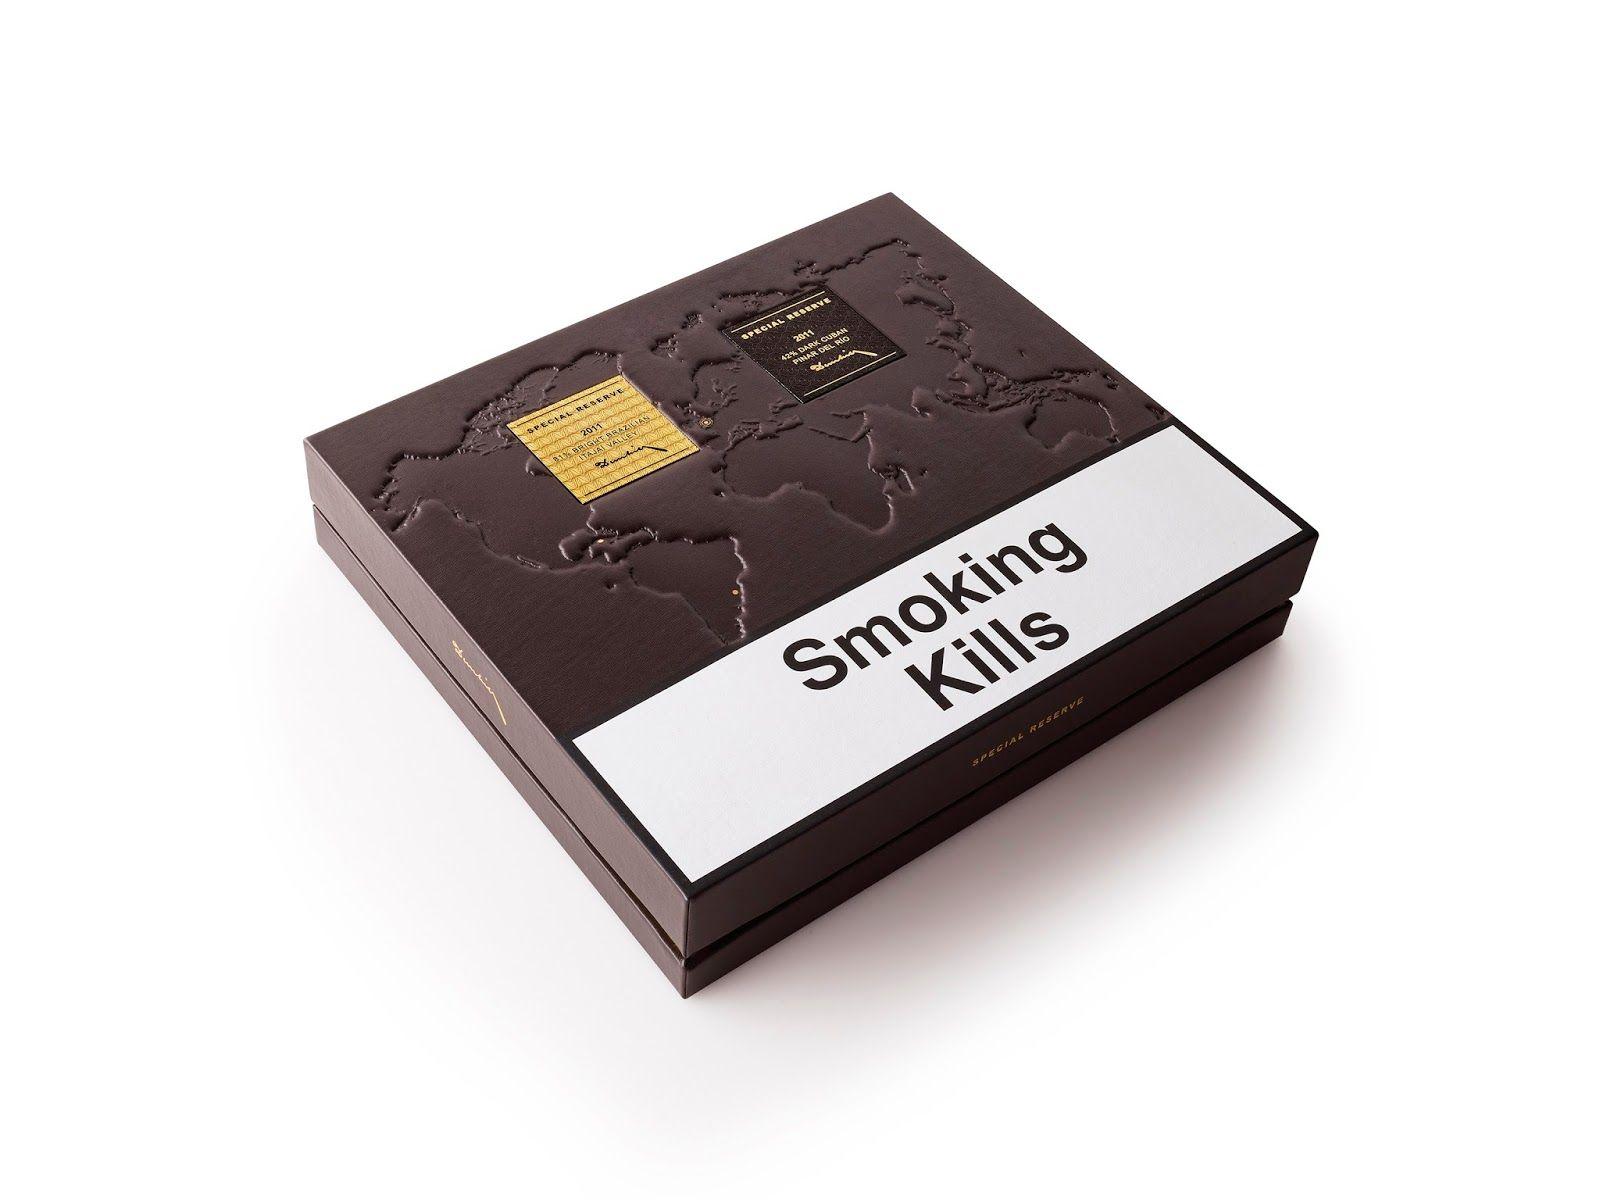 Ebay Reship Box Box Packaging Design Corrugated Packaging Creative Packaging Design